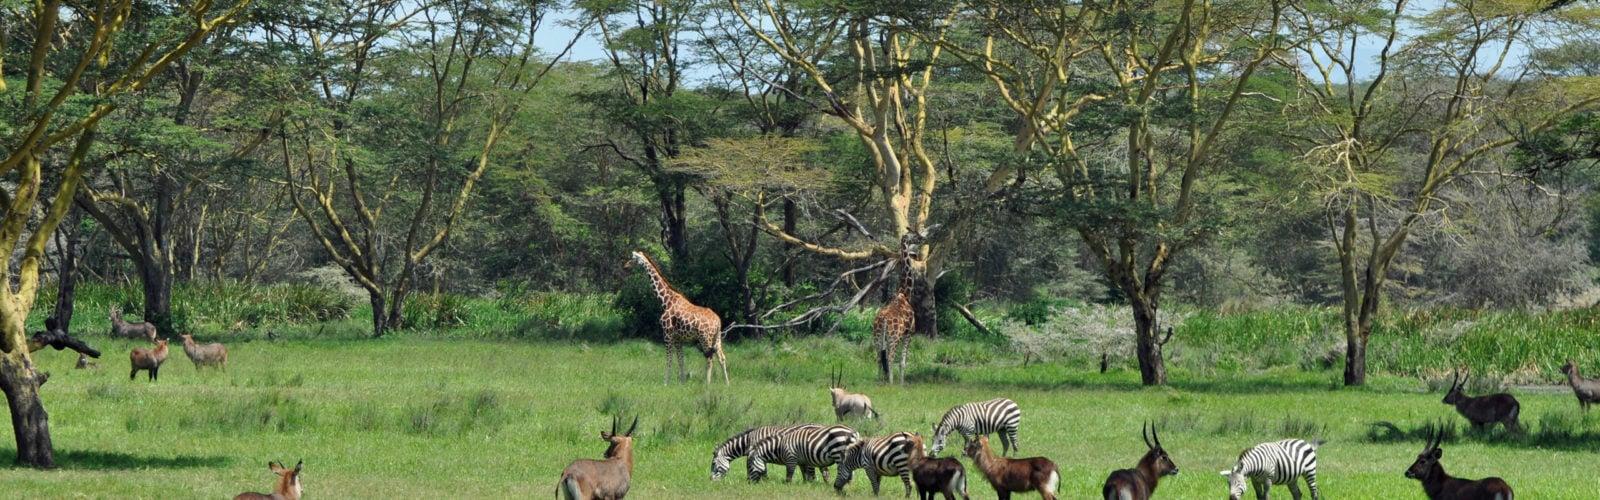 Solio Lodge, Solio Game Reserve, Kenya